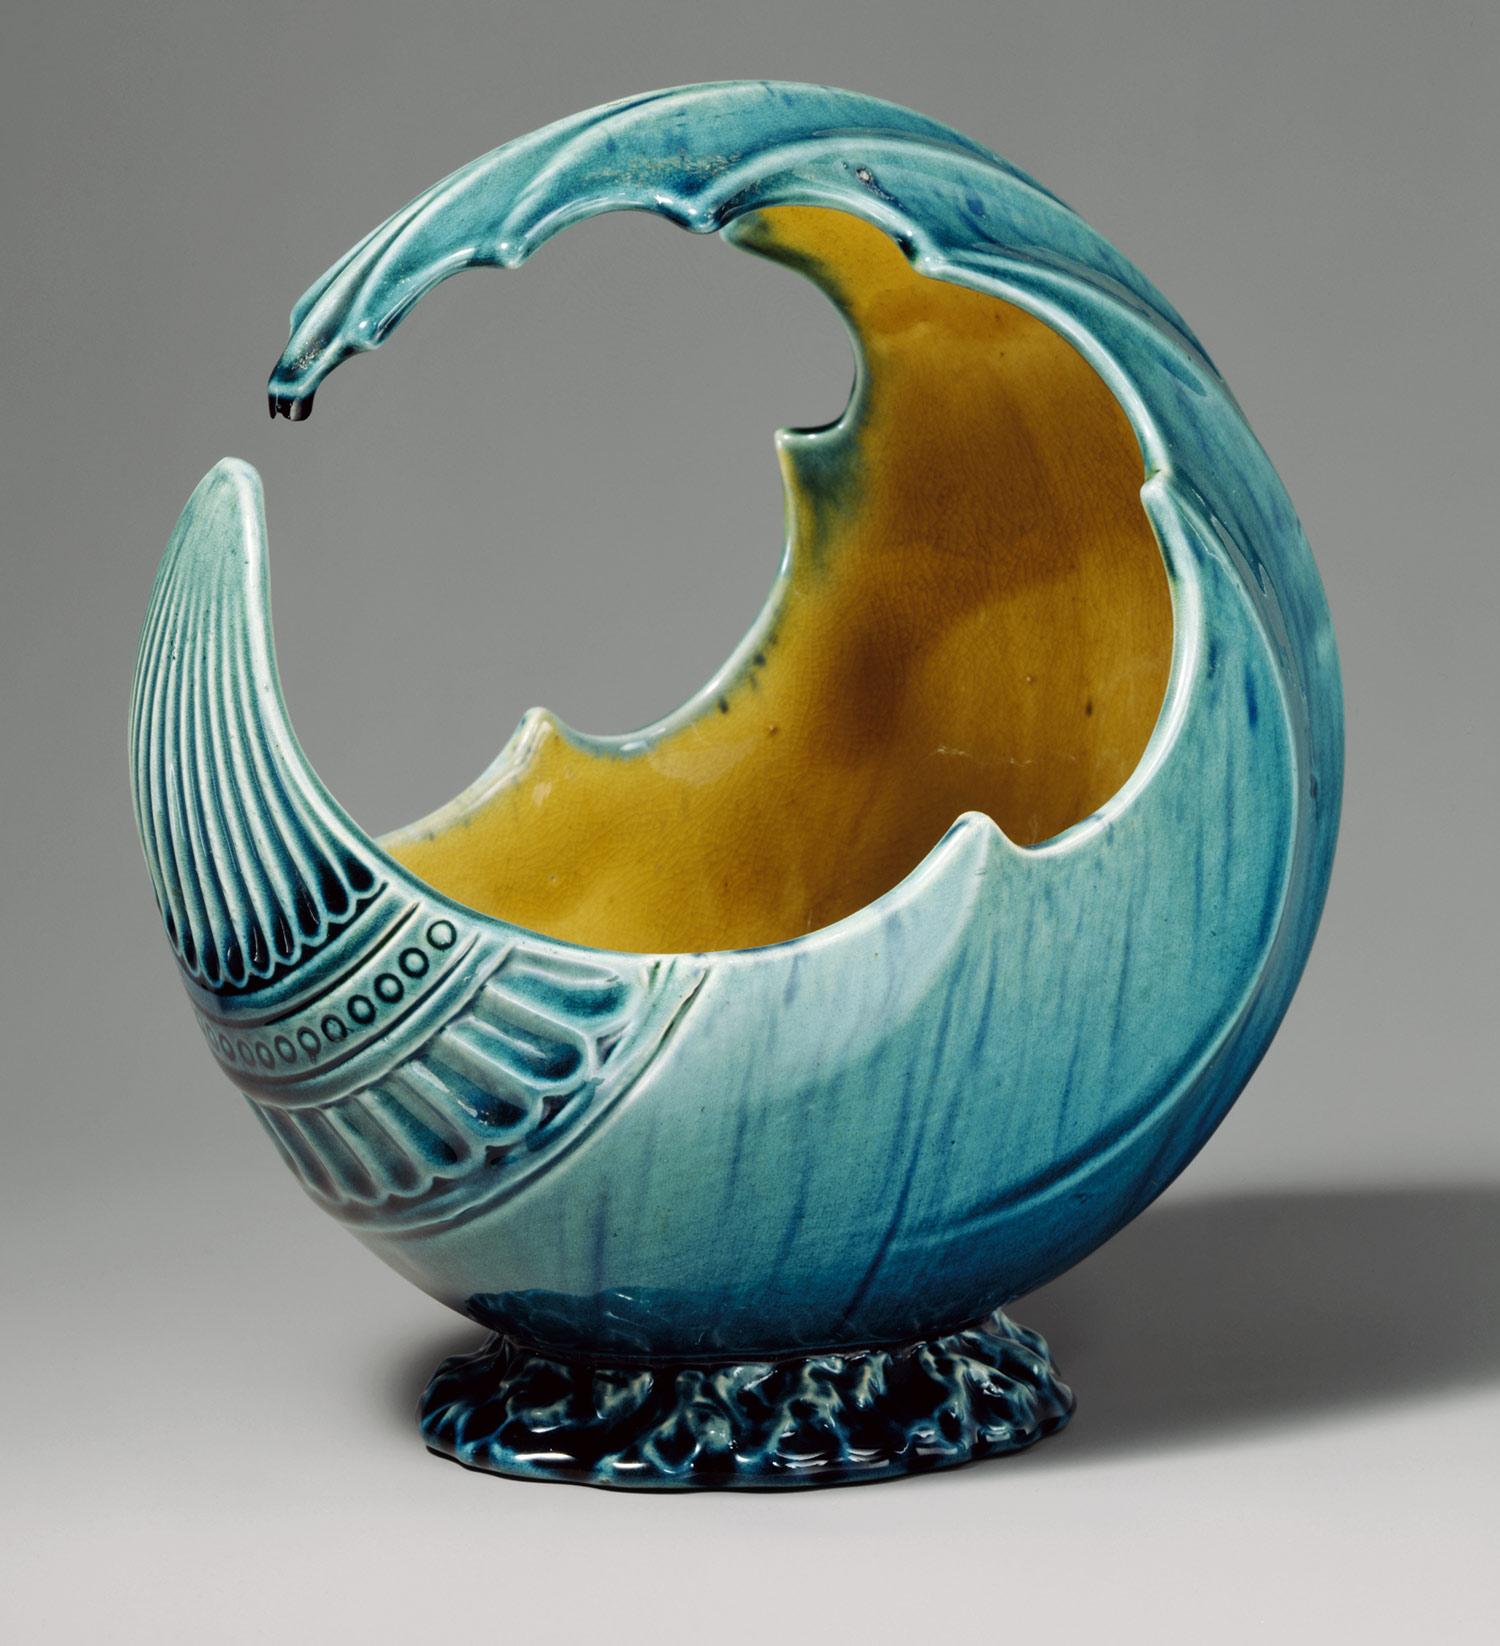 Wave Bowl by Christopher Dresser (1880)